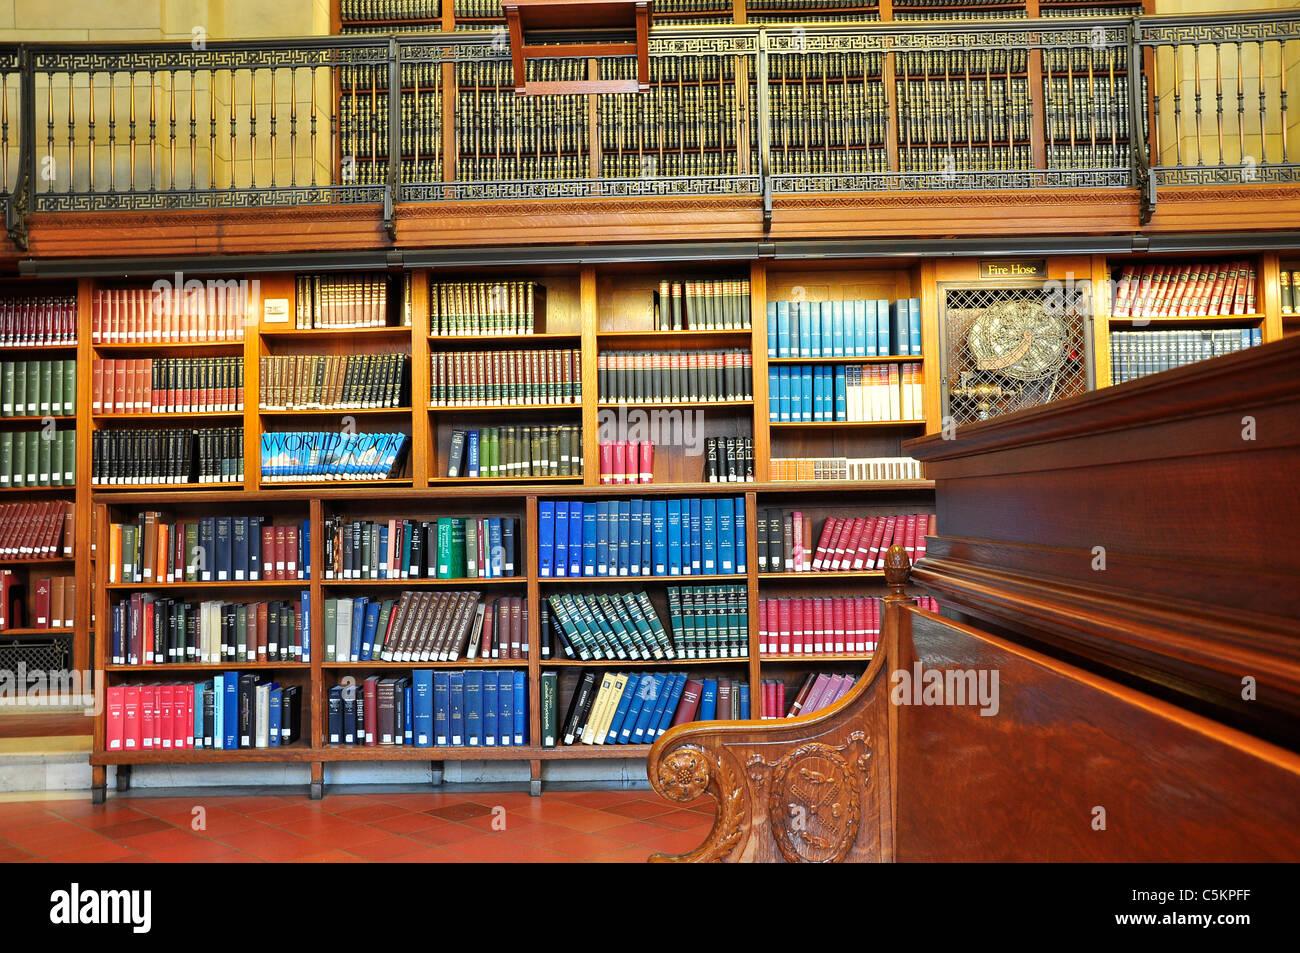 Bookshelves of New York City Public Library. - Stock Image